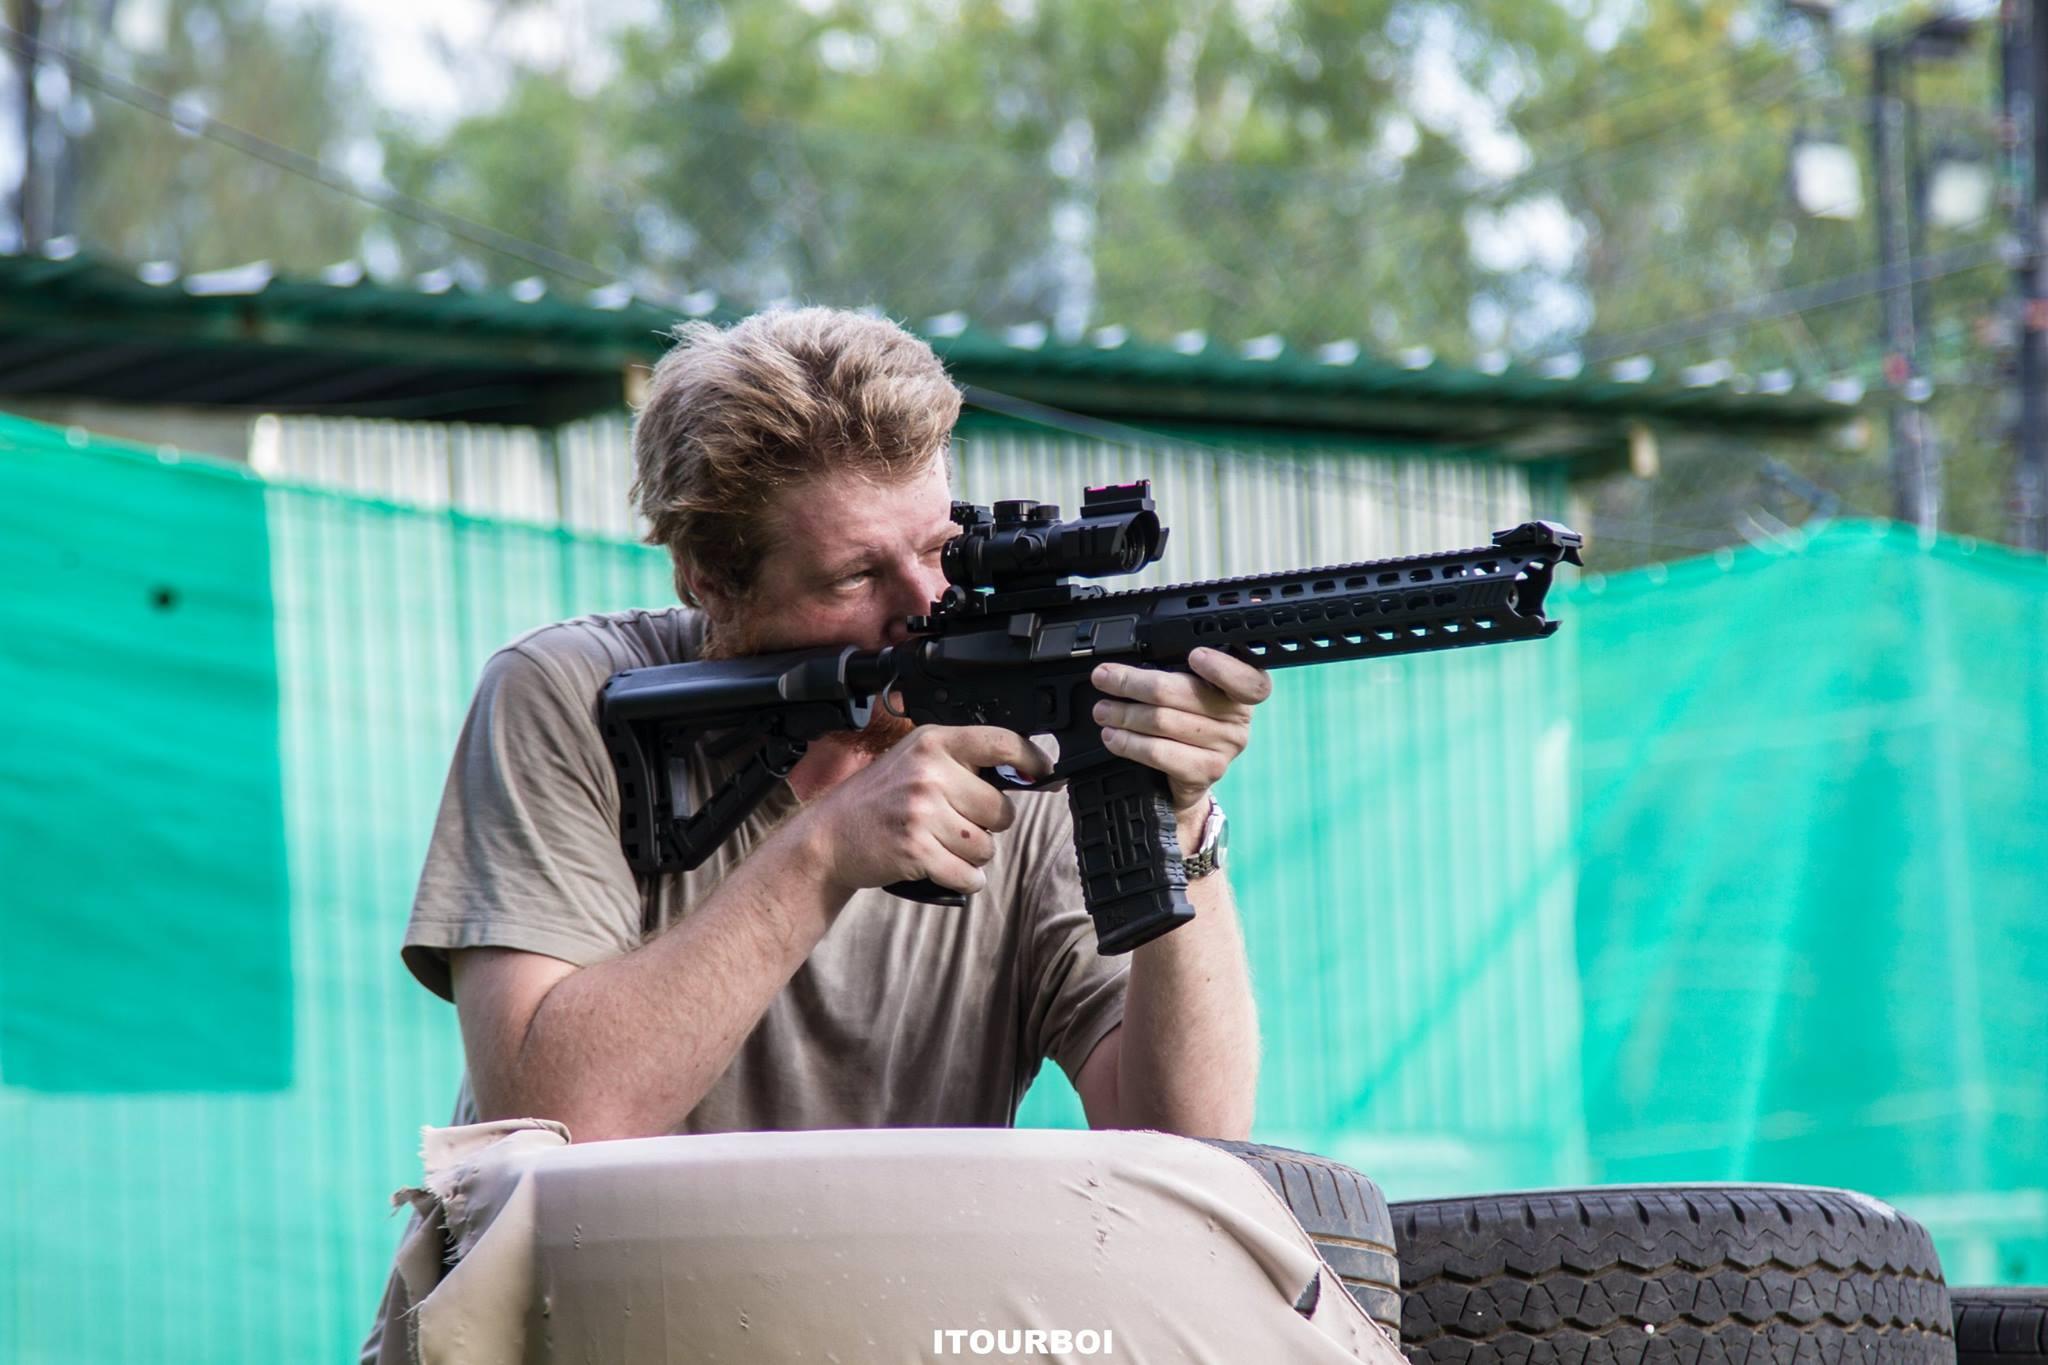 Checking the new sight on my new rifle at Phuket Airsoft Club, Thailand